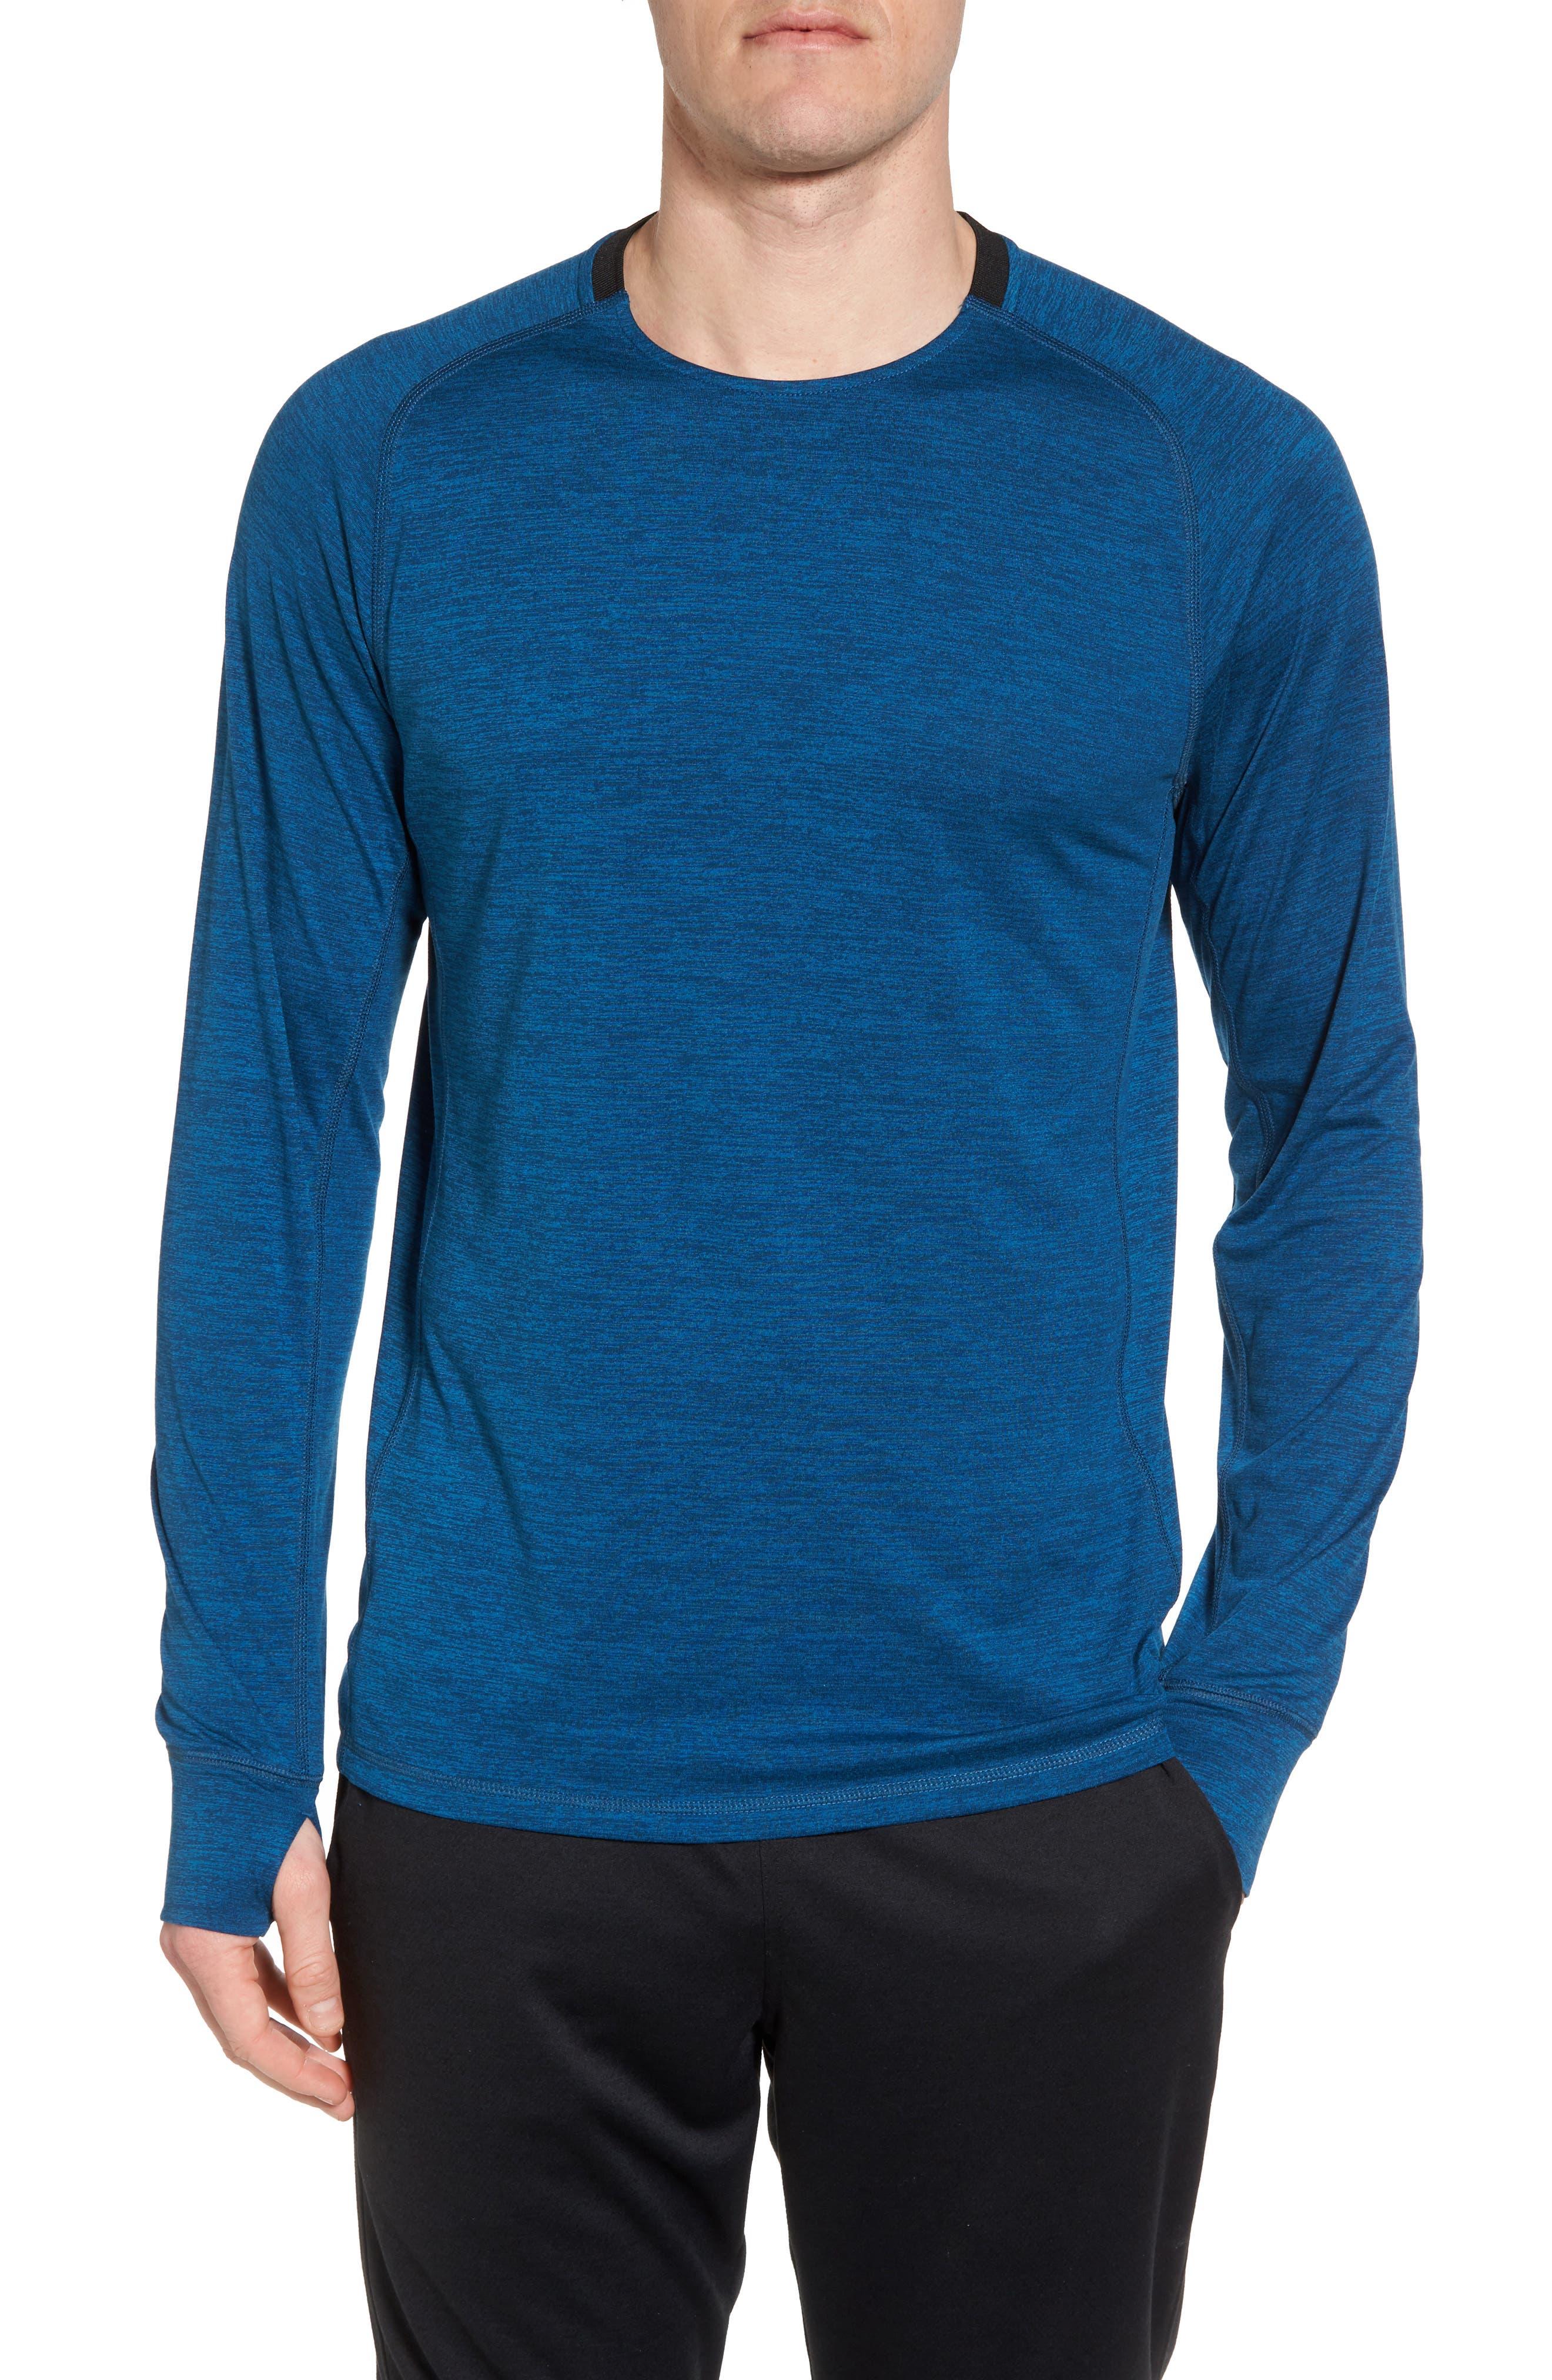 Larosite Athletic Fit T-Shirt,                         Main,                         color, Blue Iolite Melange